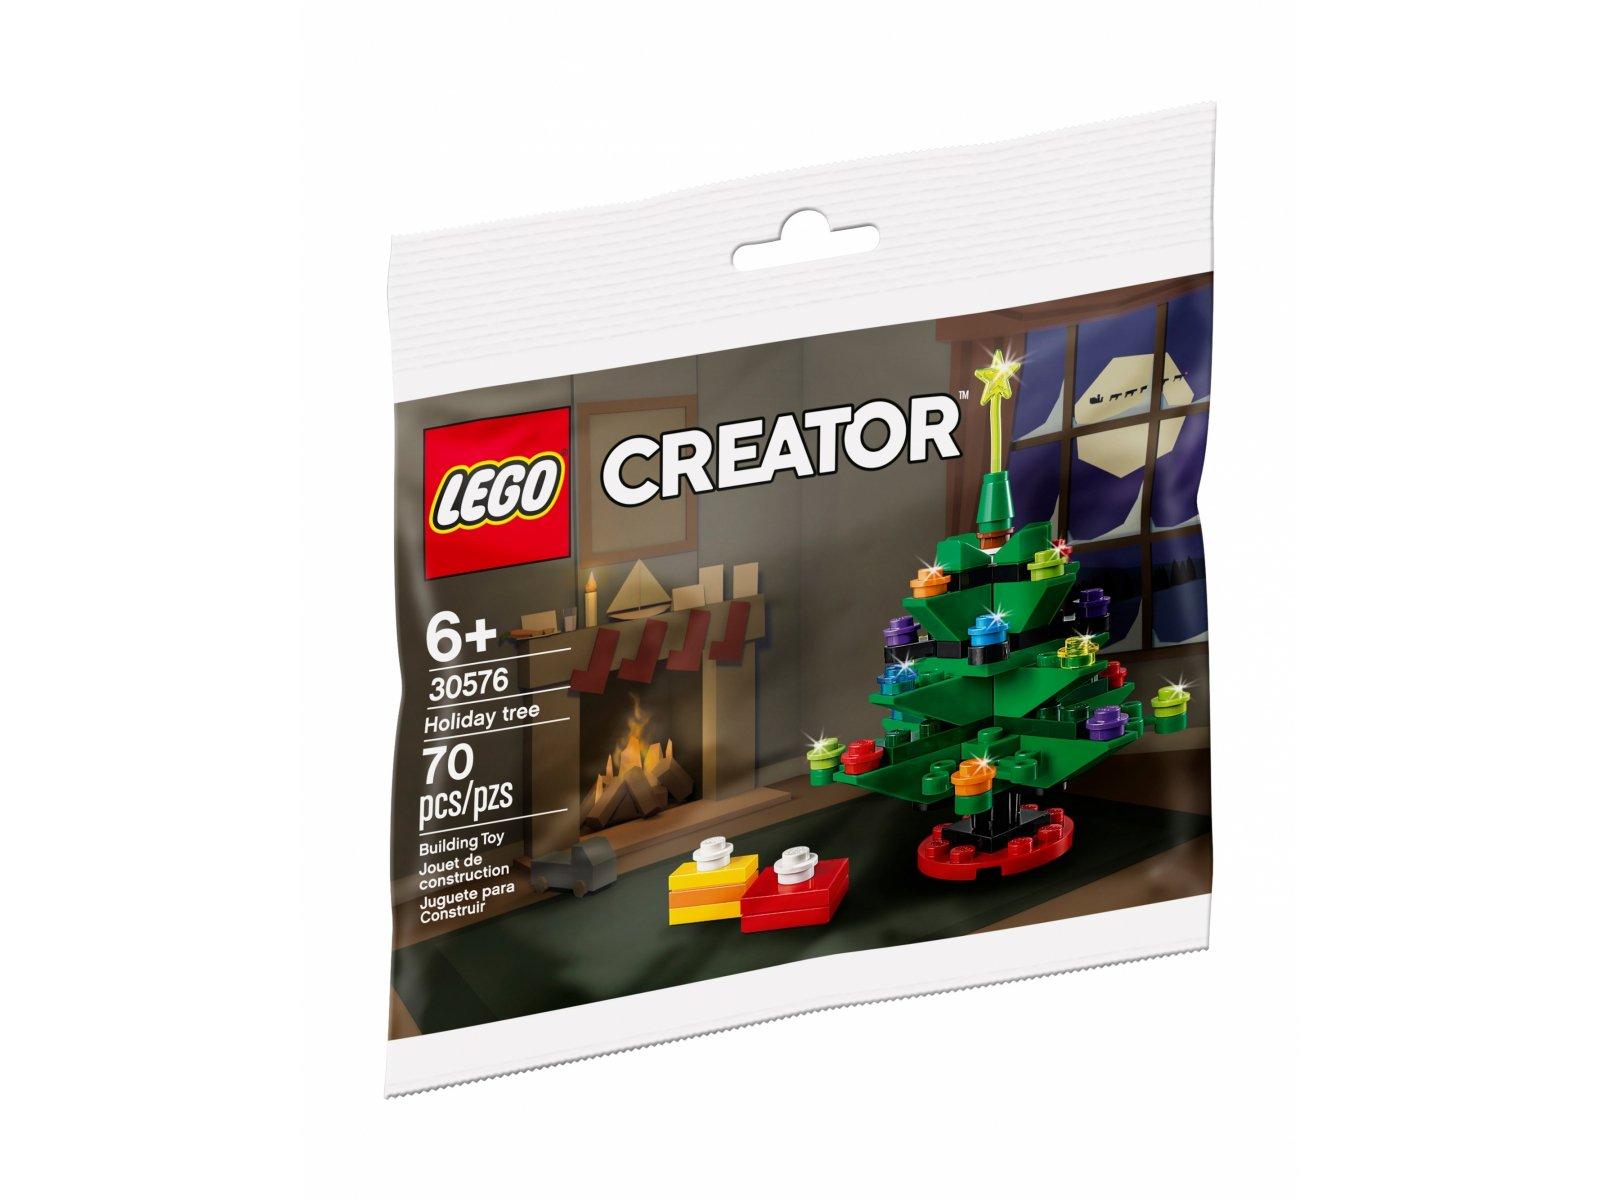 LEGO 30576 Choinka